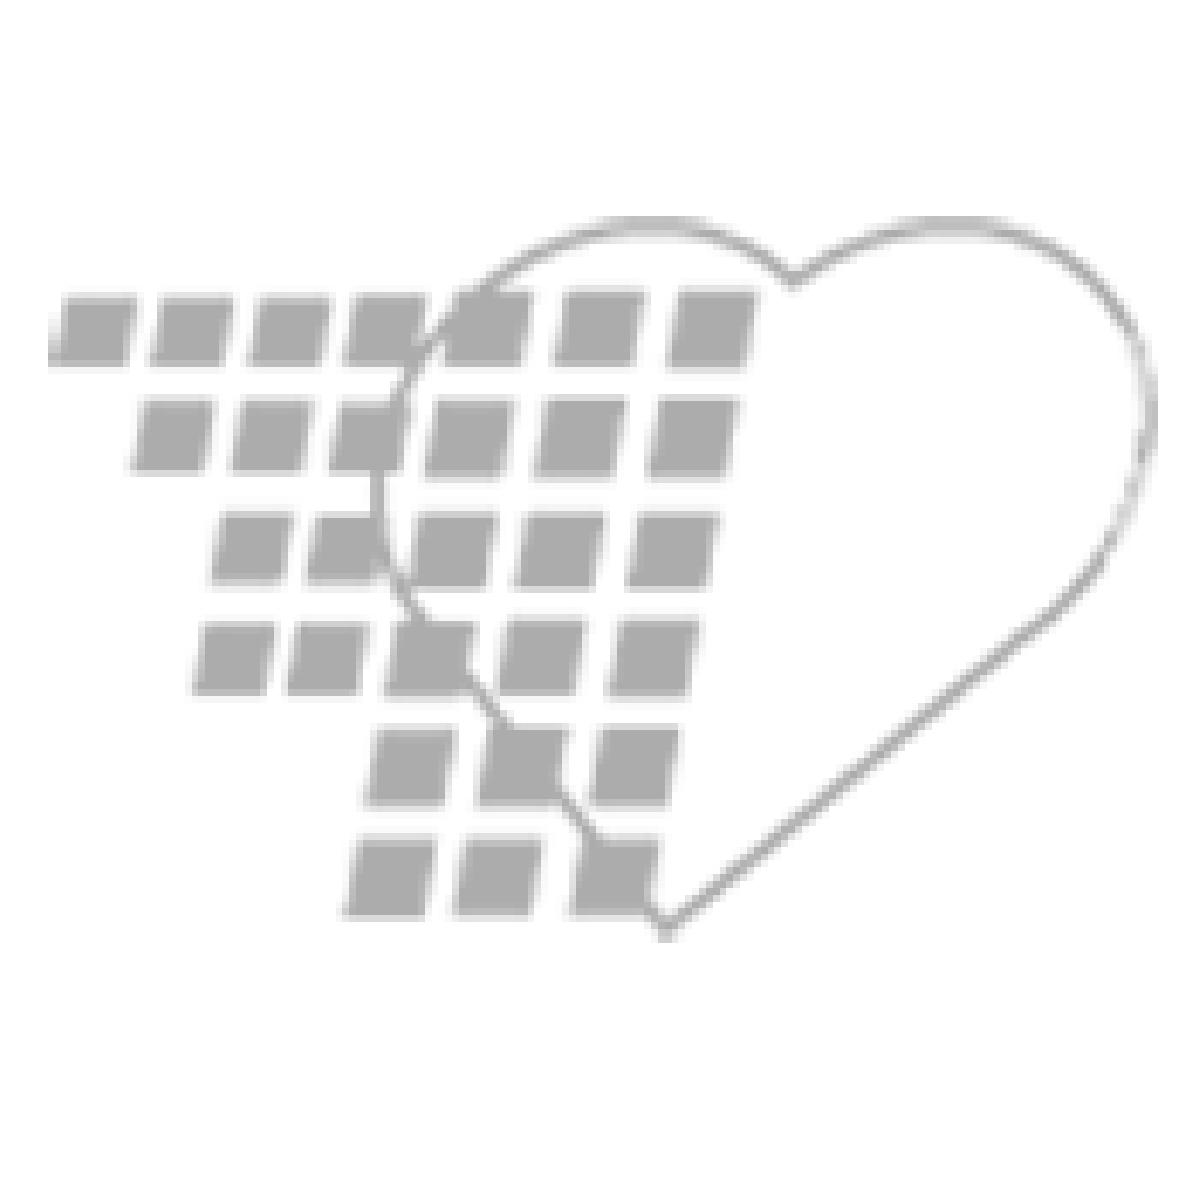 03-47-1096 - Clear PETG Plastic Glove Dispenser